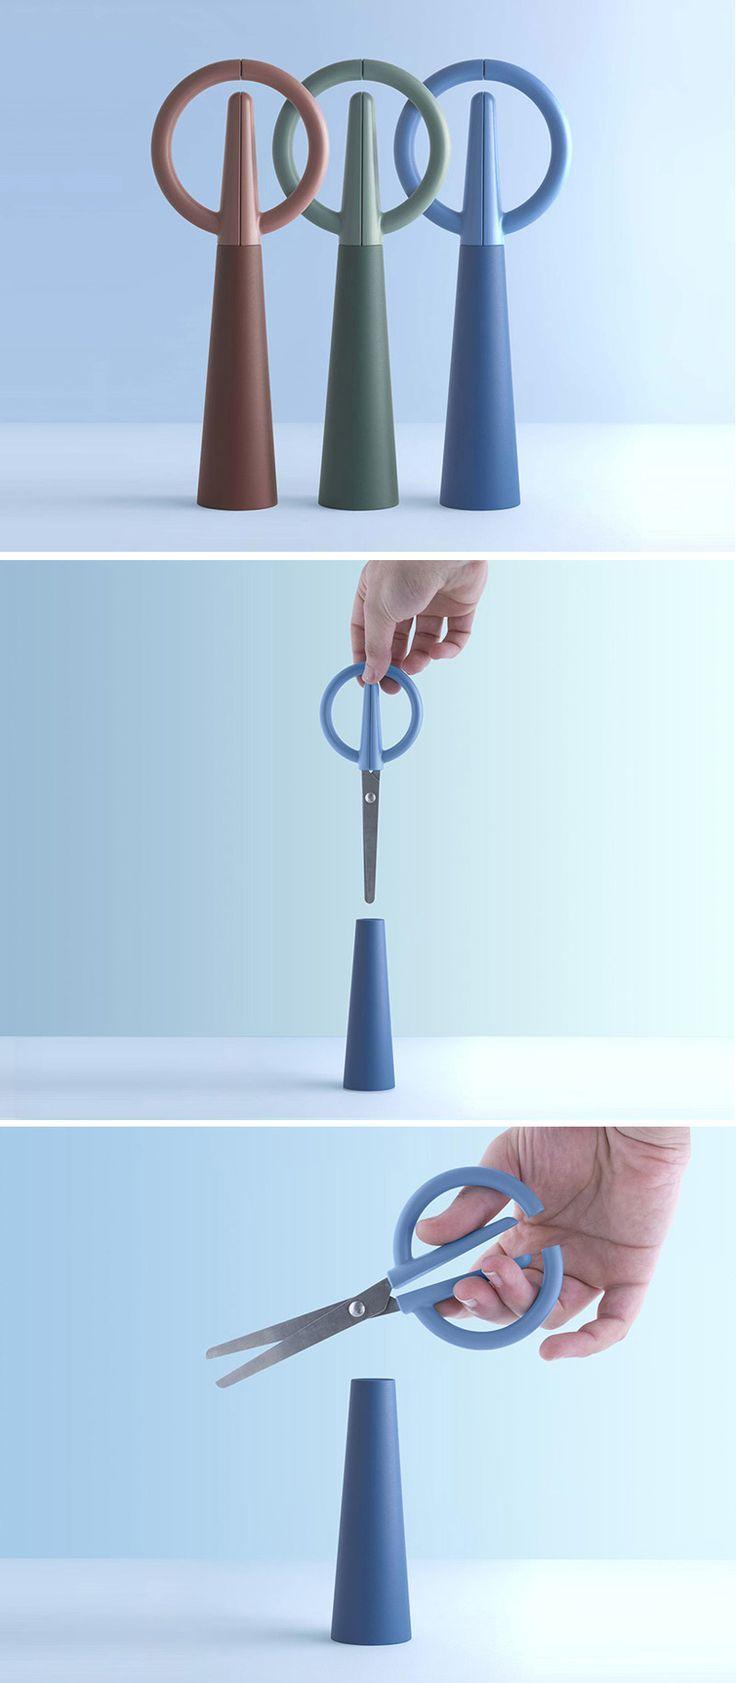 Alessio Romano Designs Scissors Hidden As A Decorative Object Product Design #productdesign